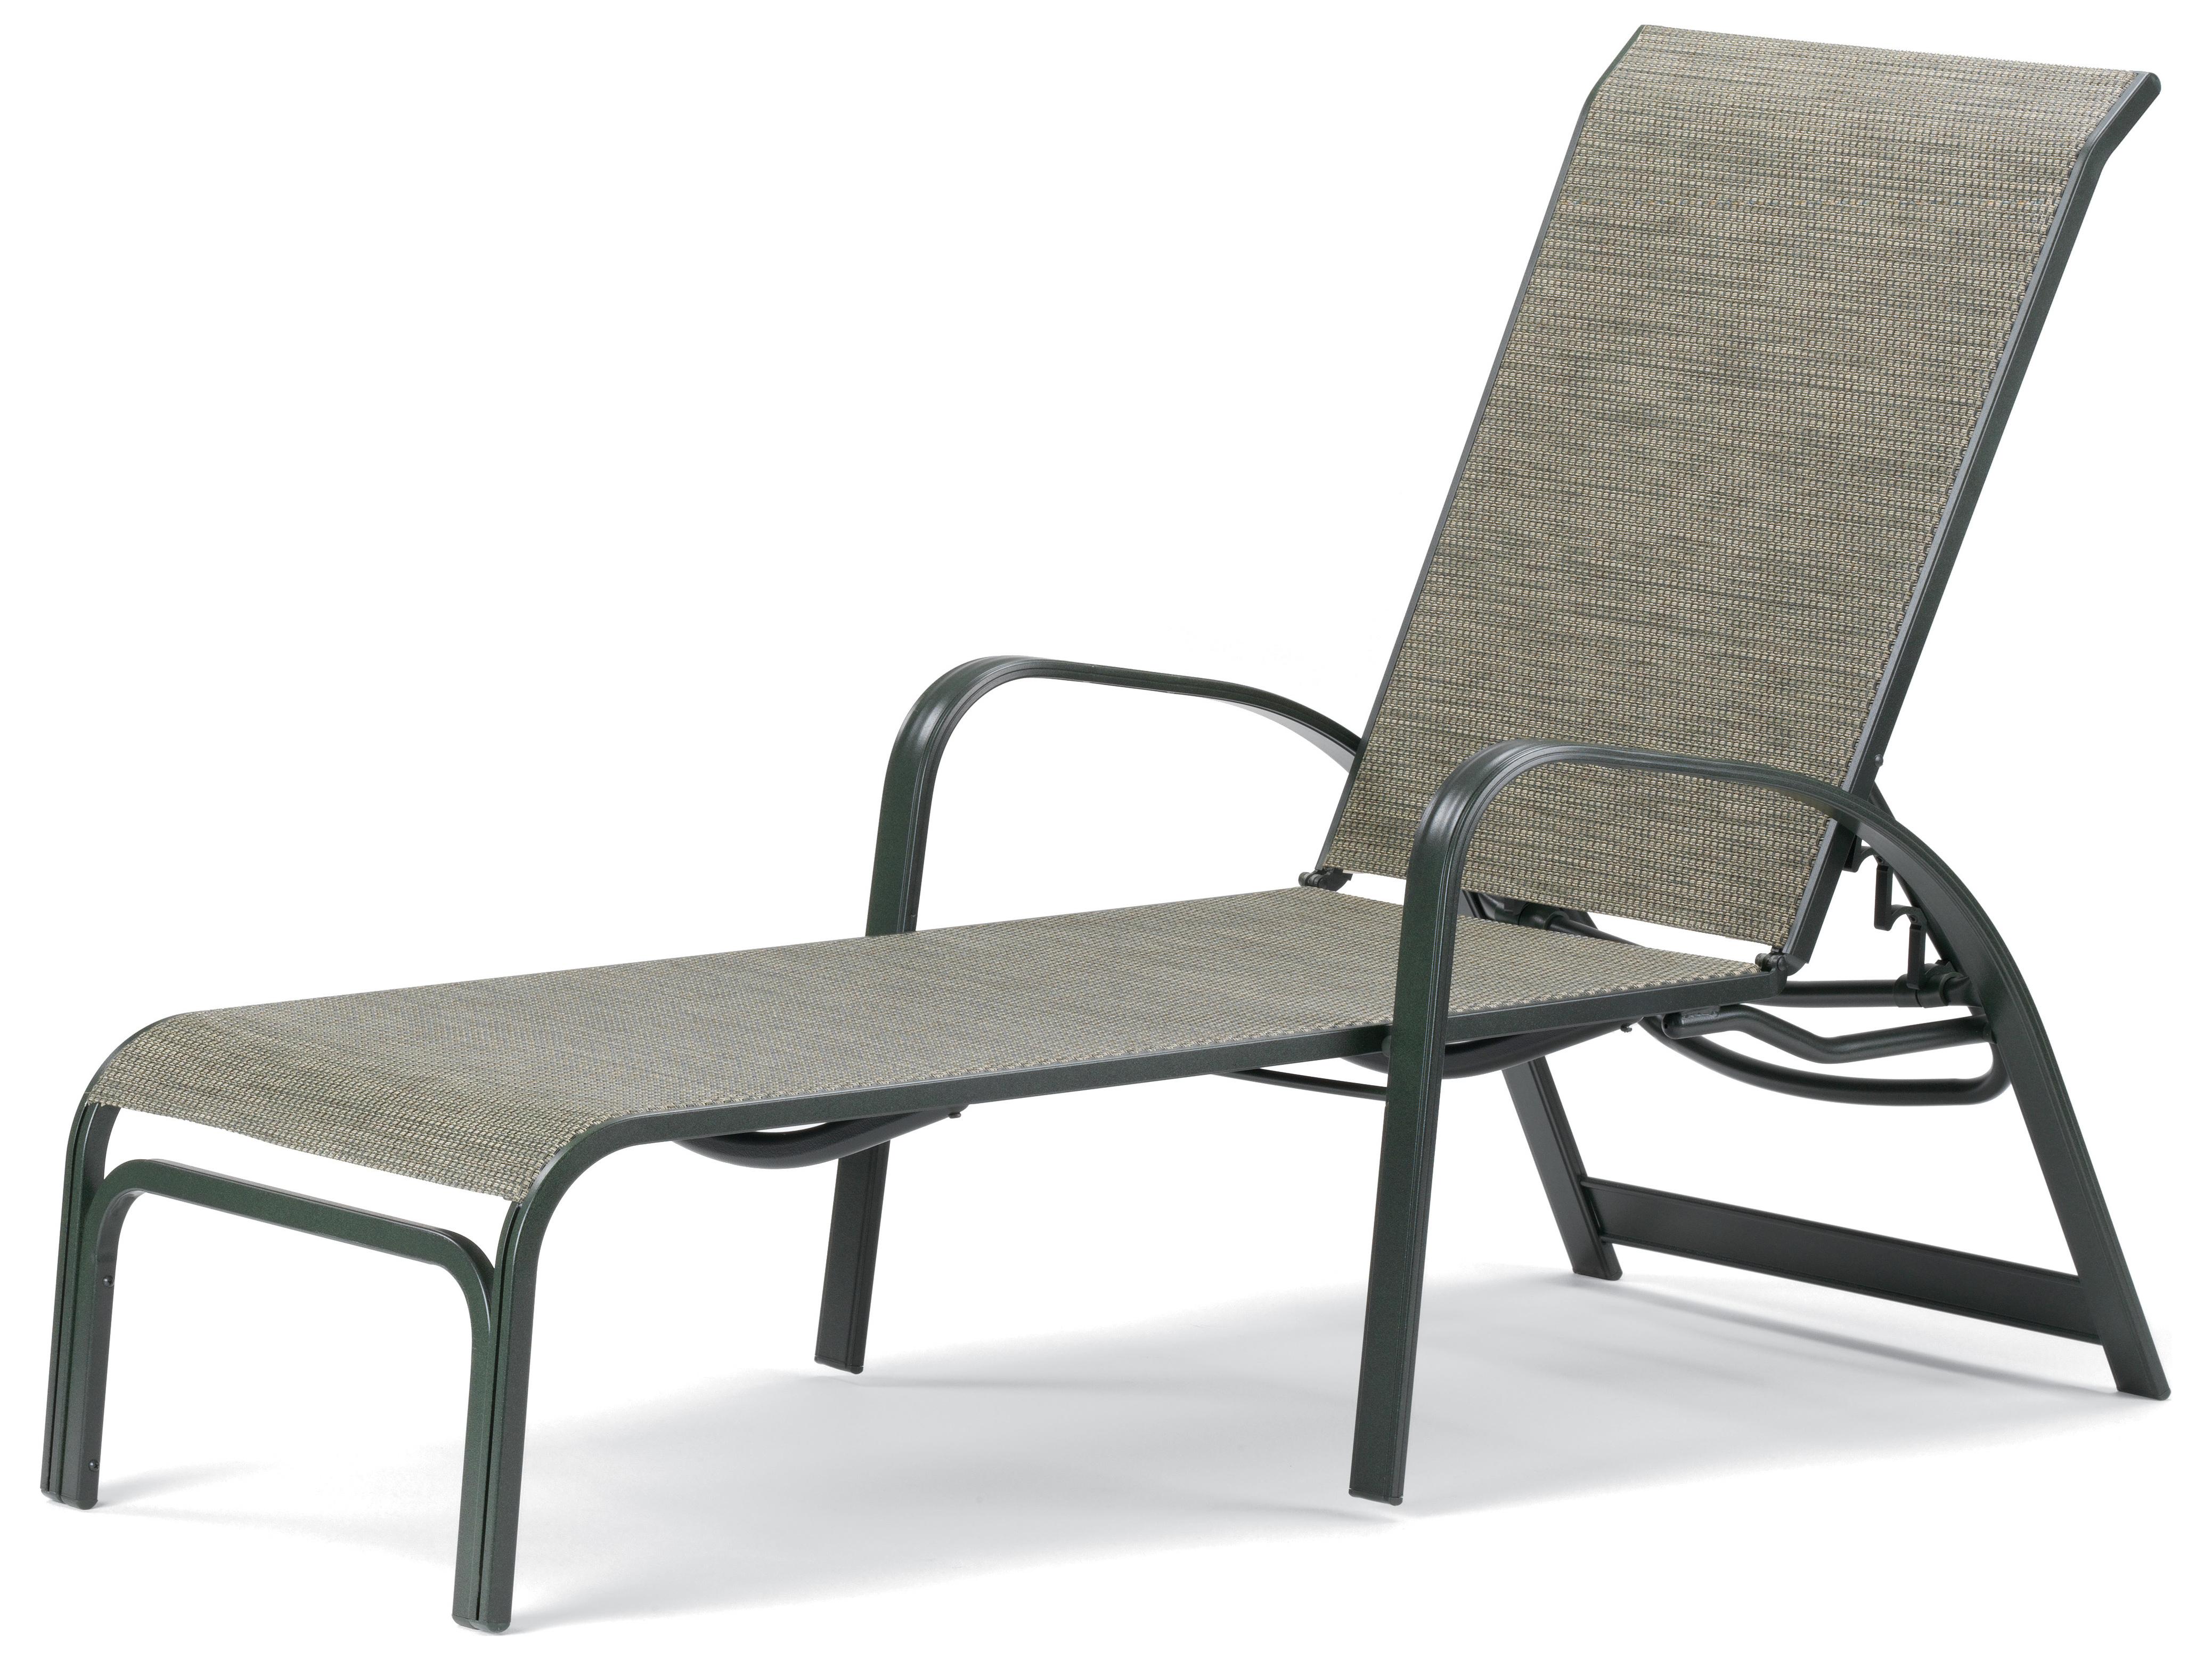 drain groupe. Black Bedroom Furniture Sets. Home Design Ideas